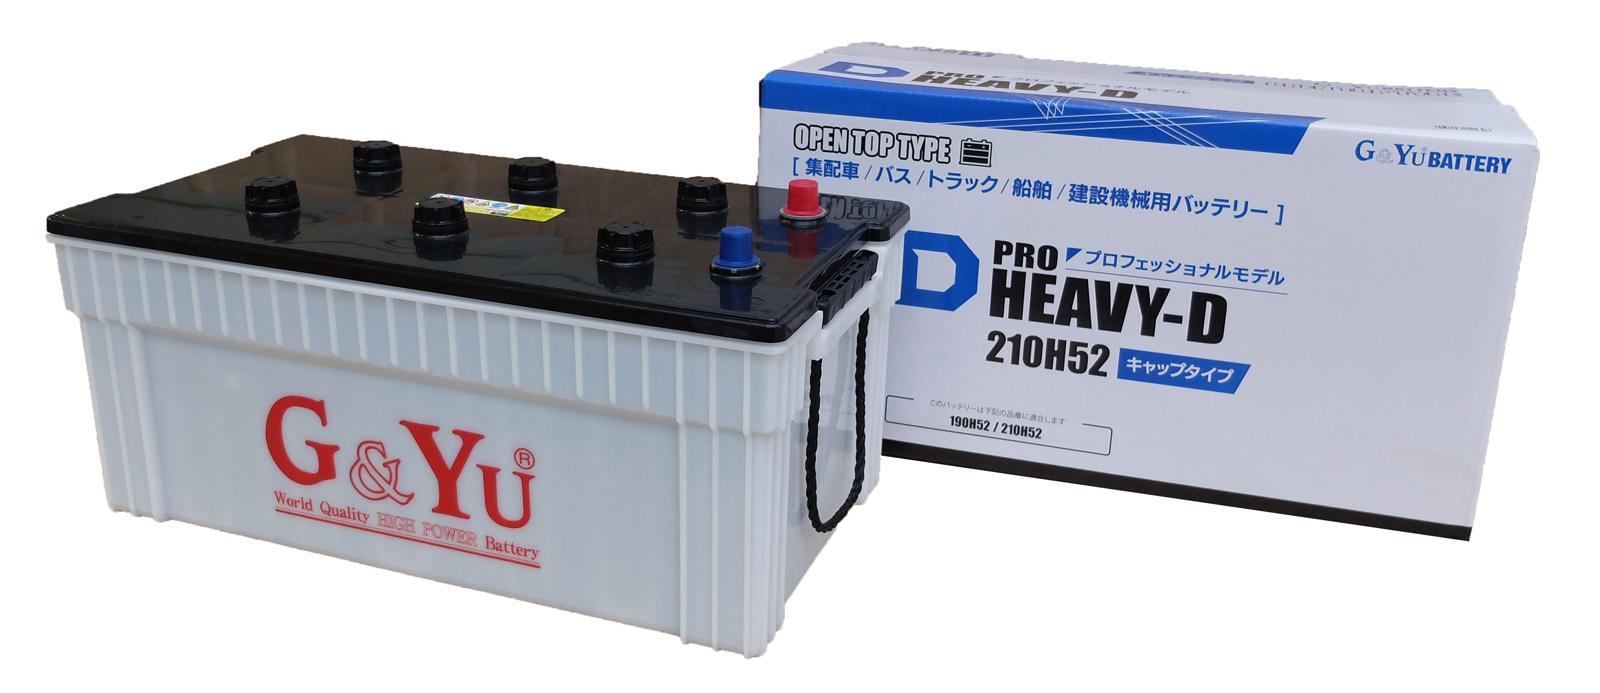 G&Yu バッテリー HD-210H52